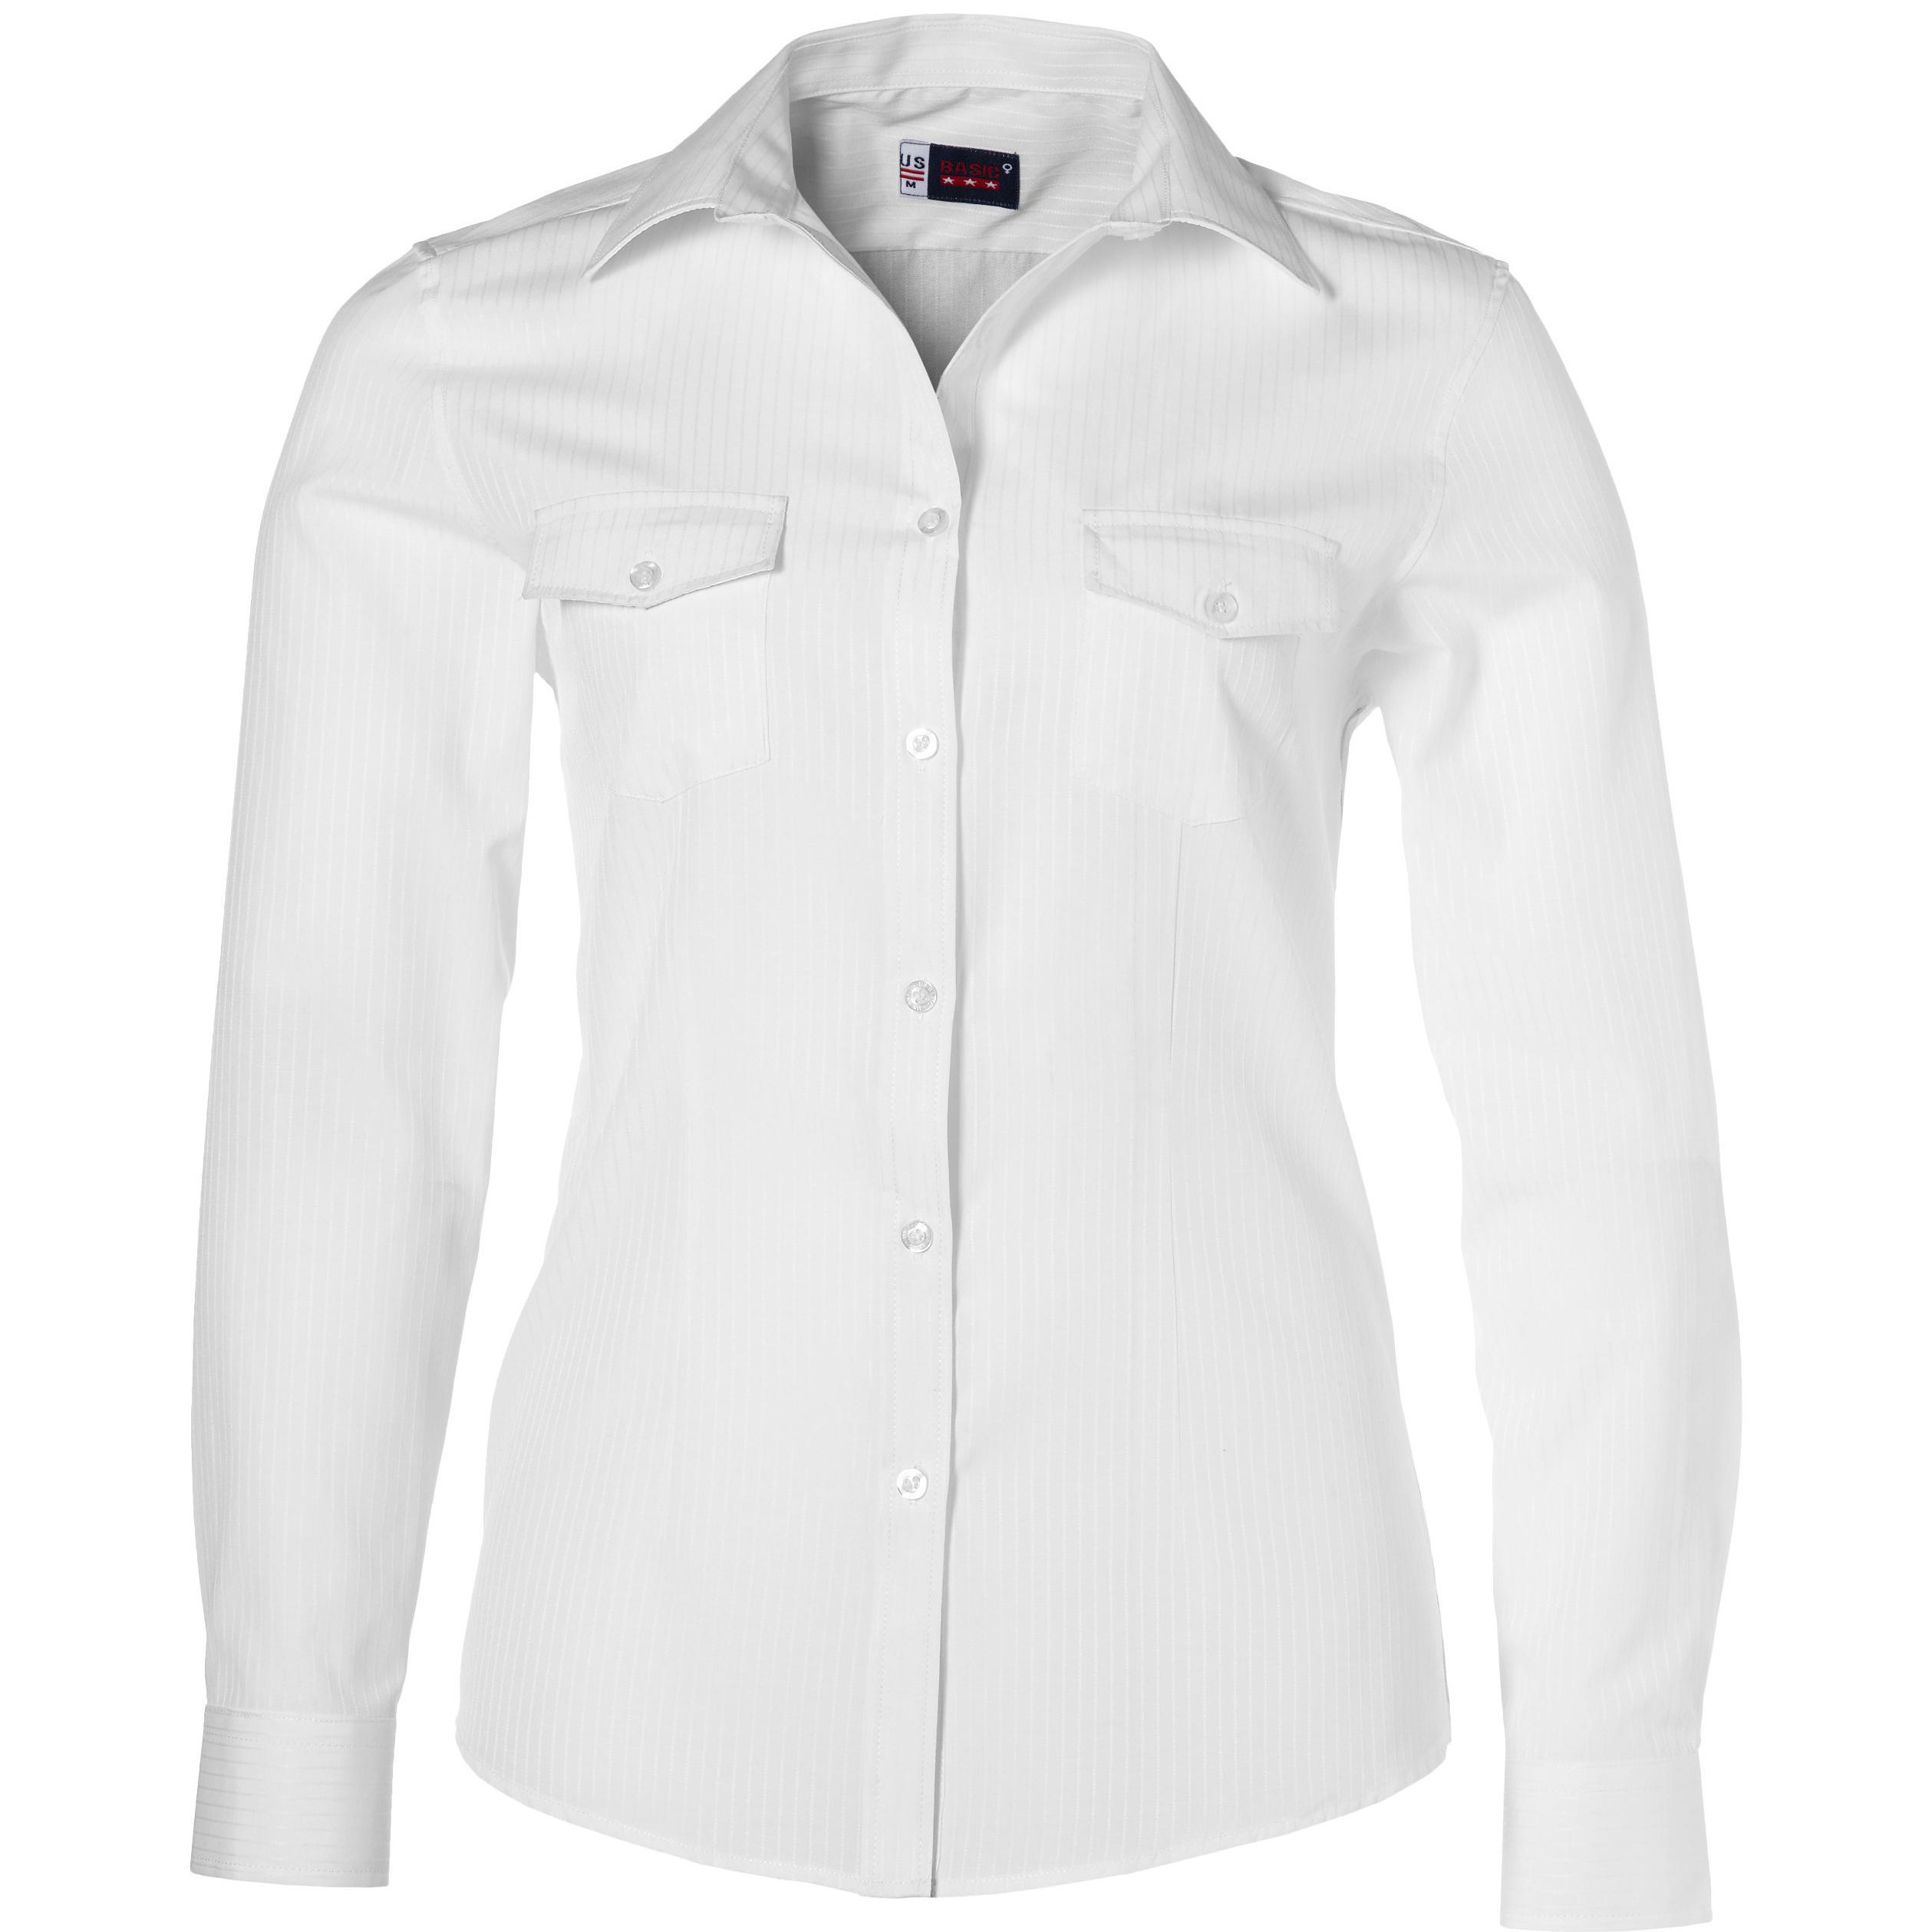 Ladies Long Sleeve Bayport Shirt -white Only